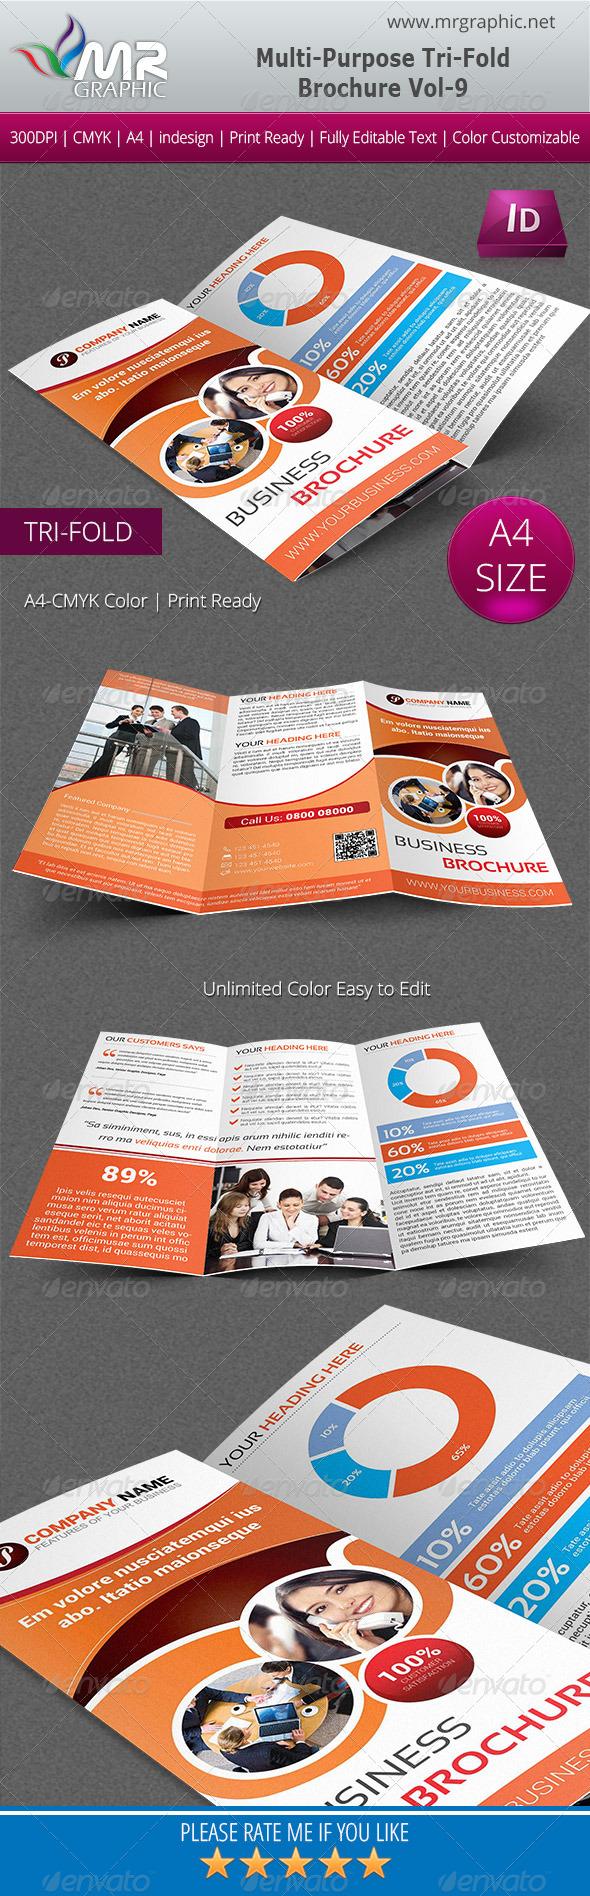 Multipurpose Business Tri-Fold Brochure Vol-09 - Corporate Brochures